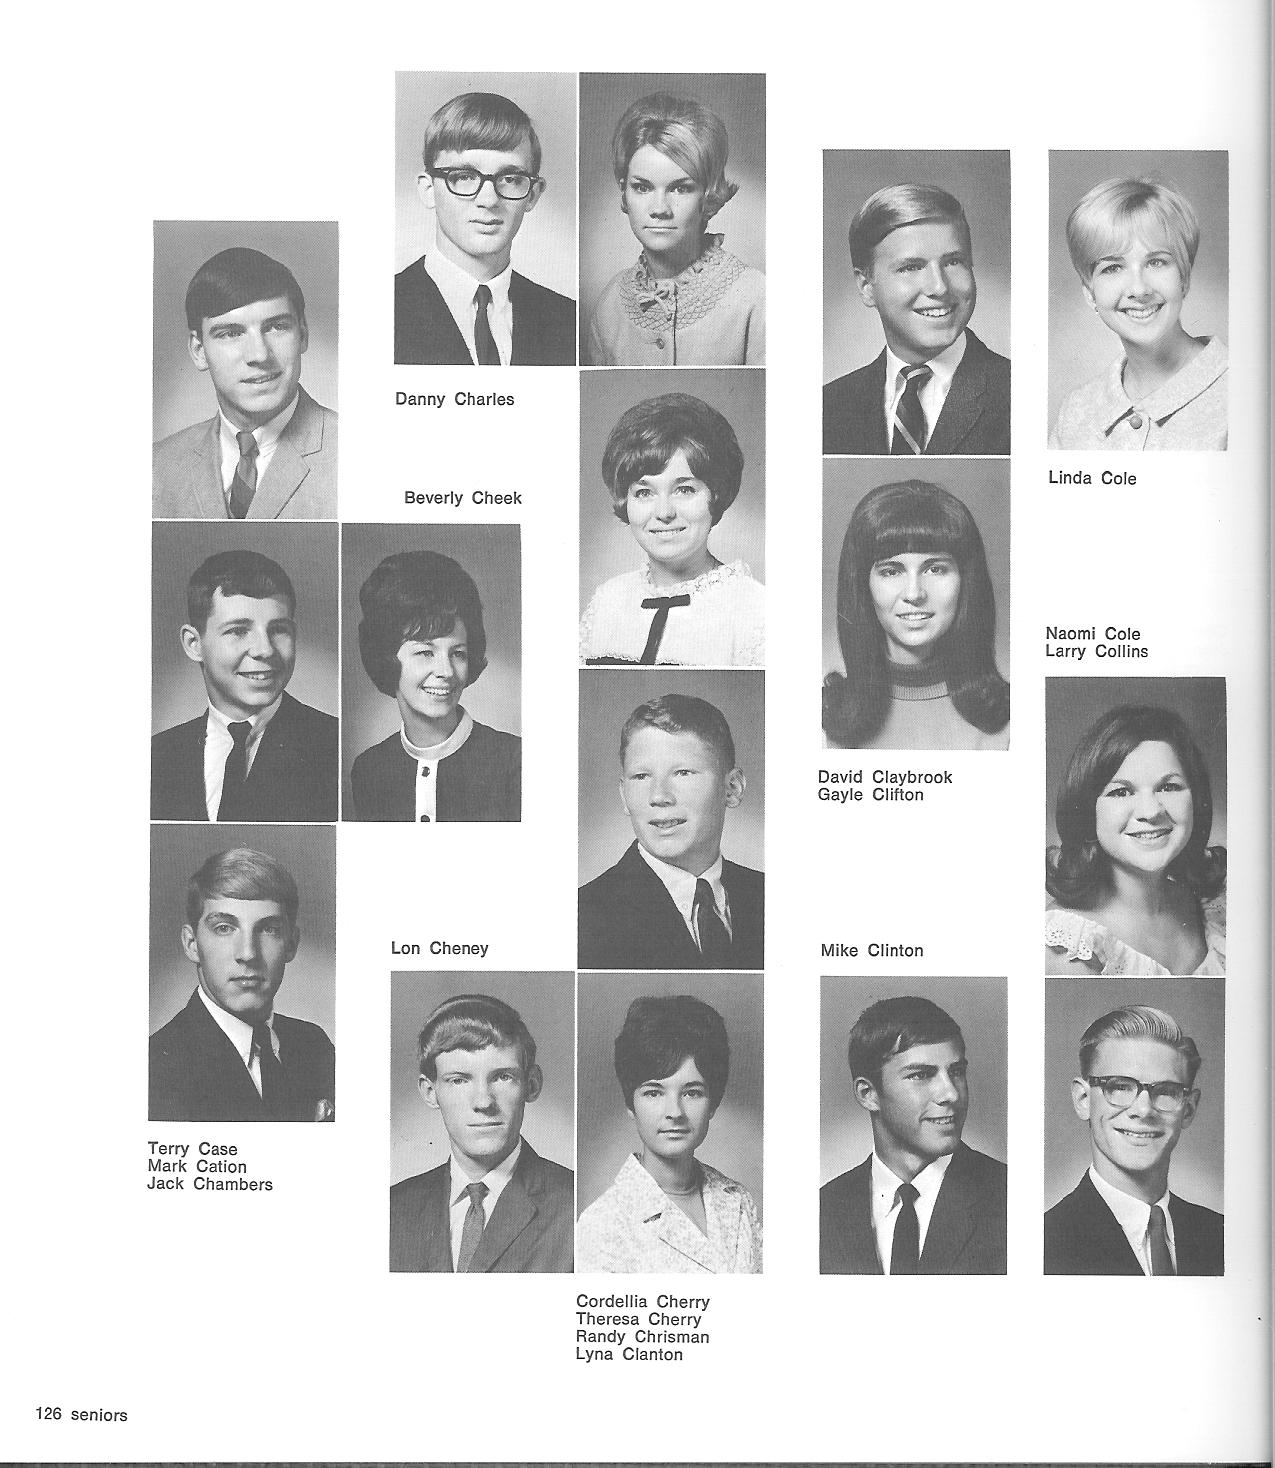 68-126